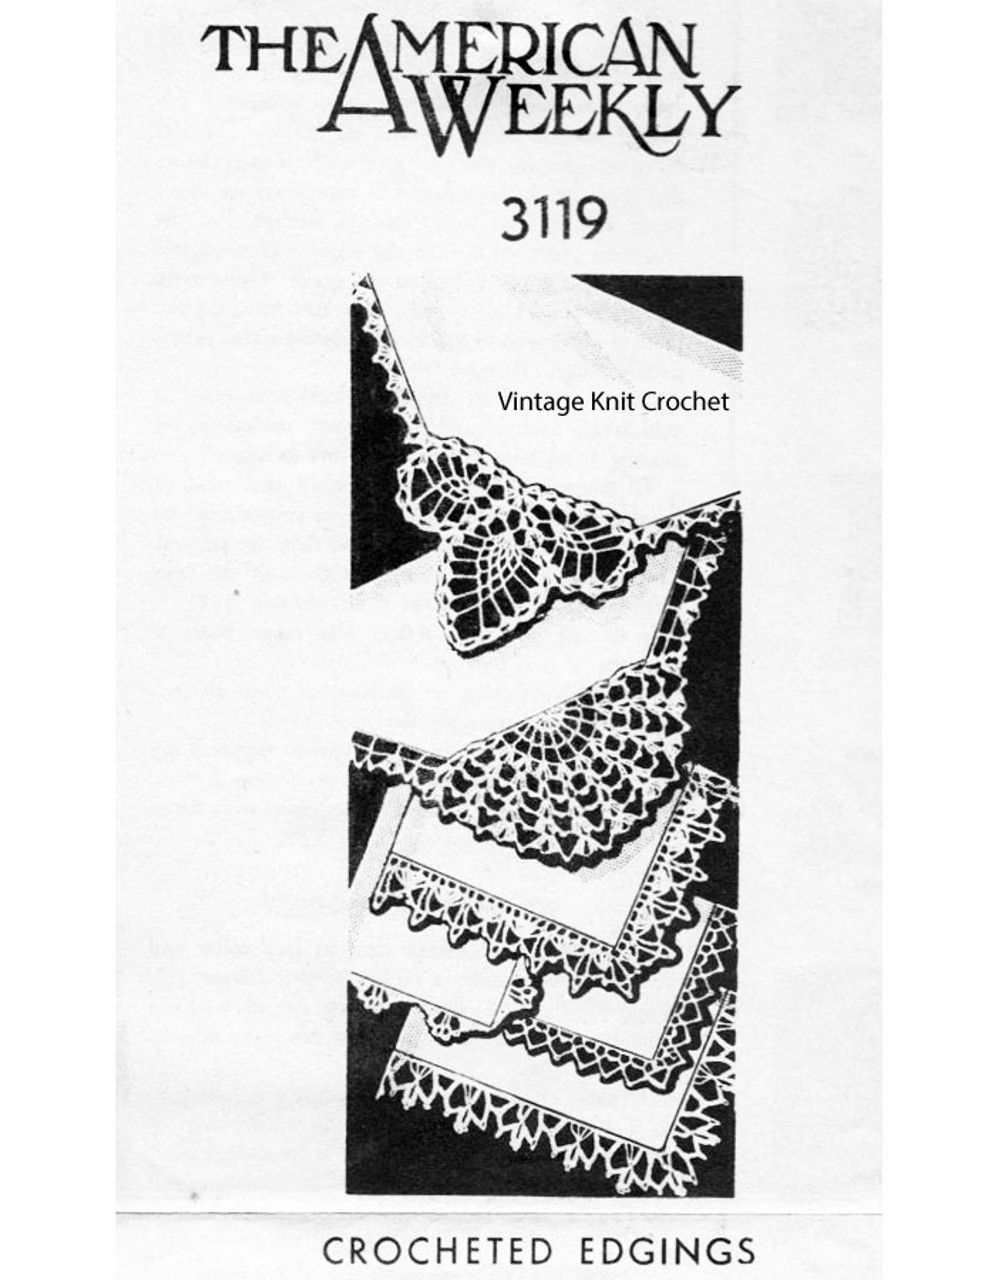 Crochet Linen Edging Pattern, American Weekly 3119